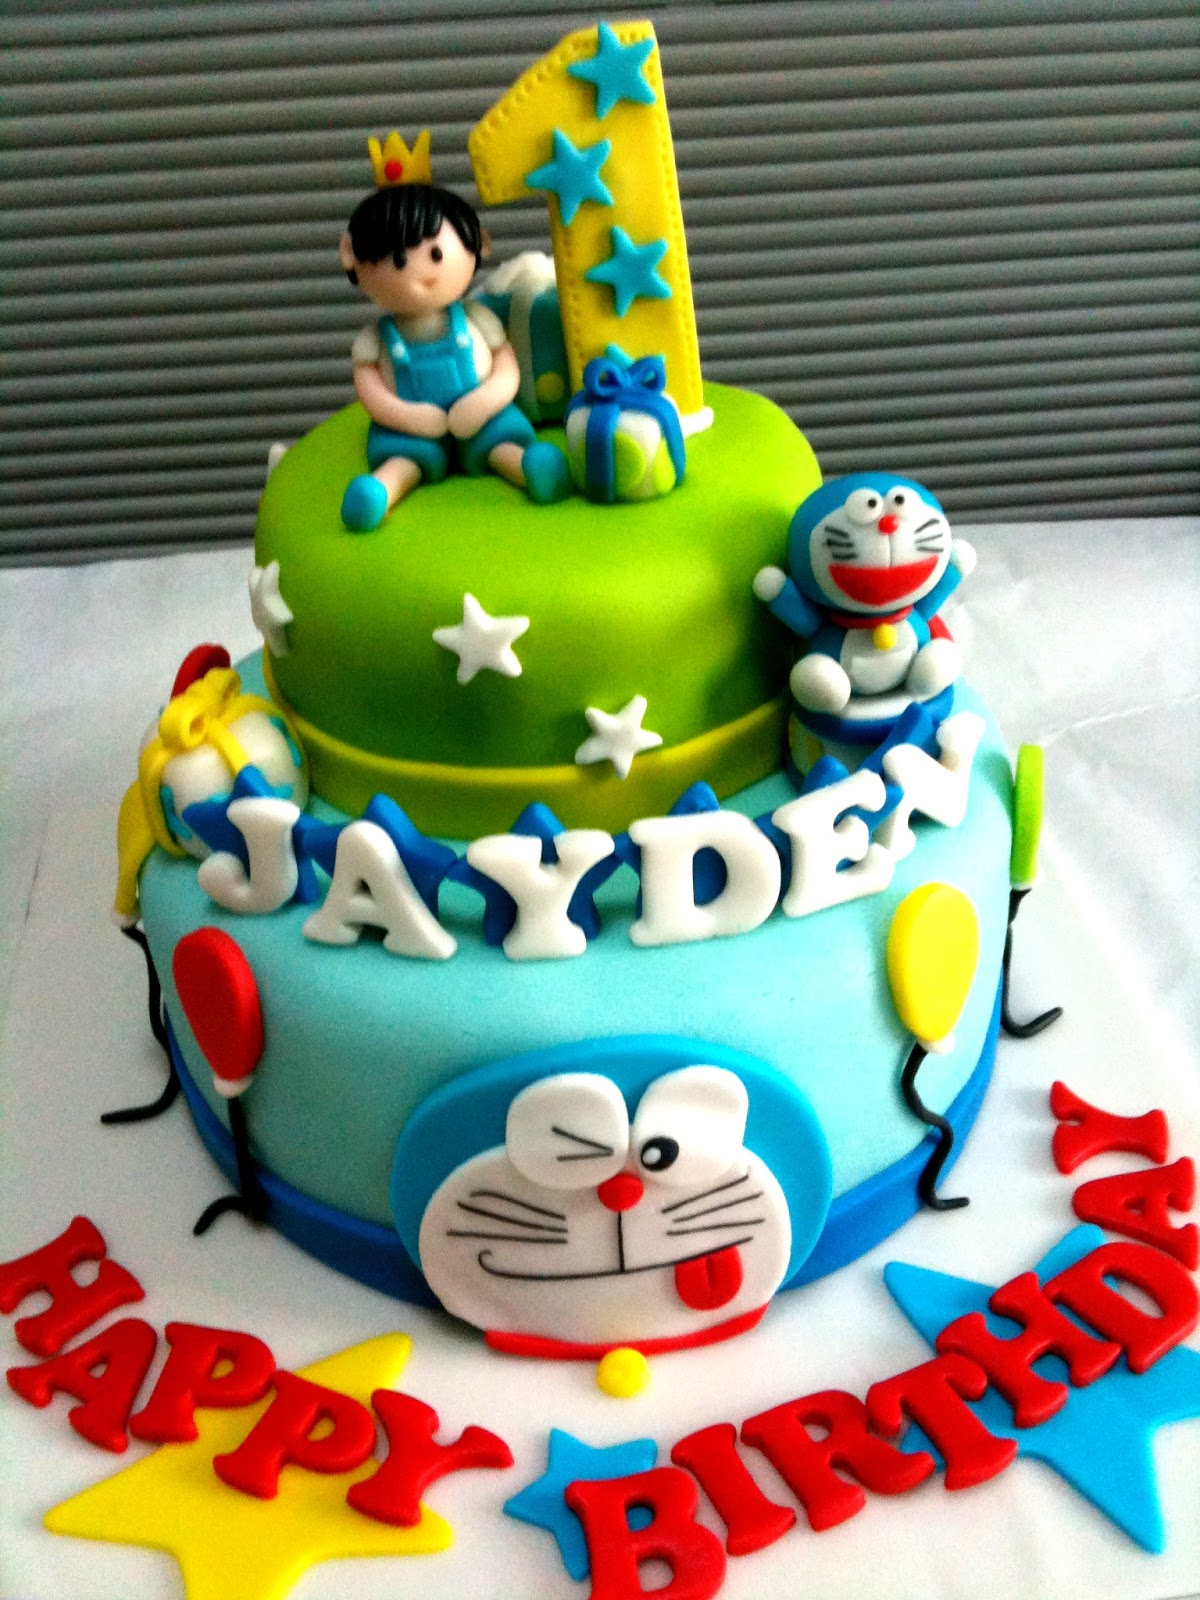 Doraemon Birthday Cake Design : Oven Creations: Happy 1st Birthday Jayden